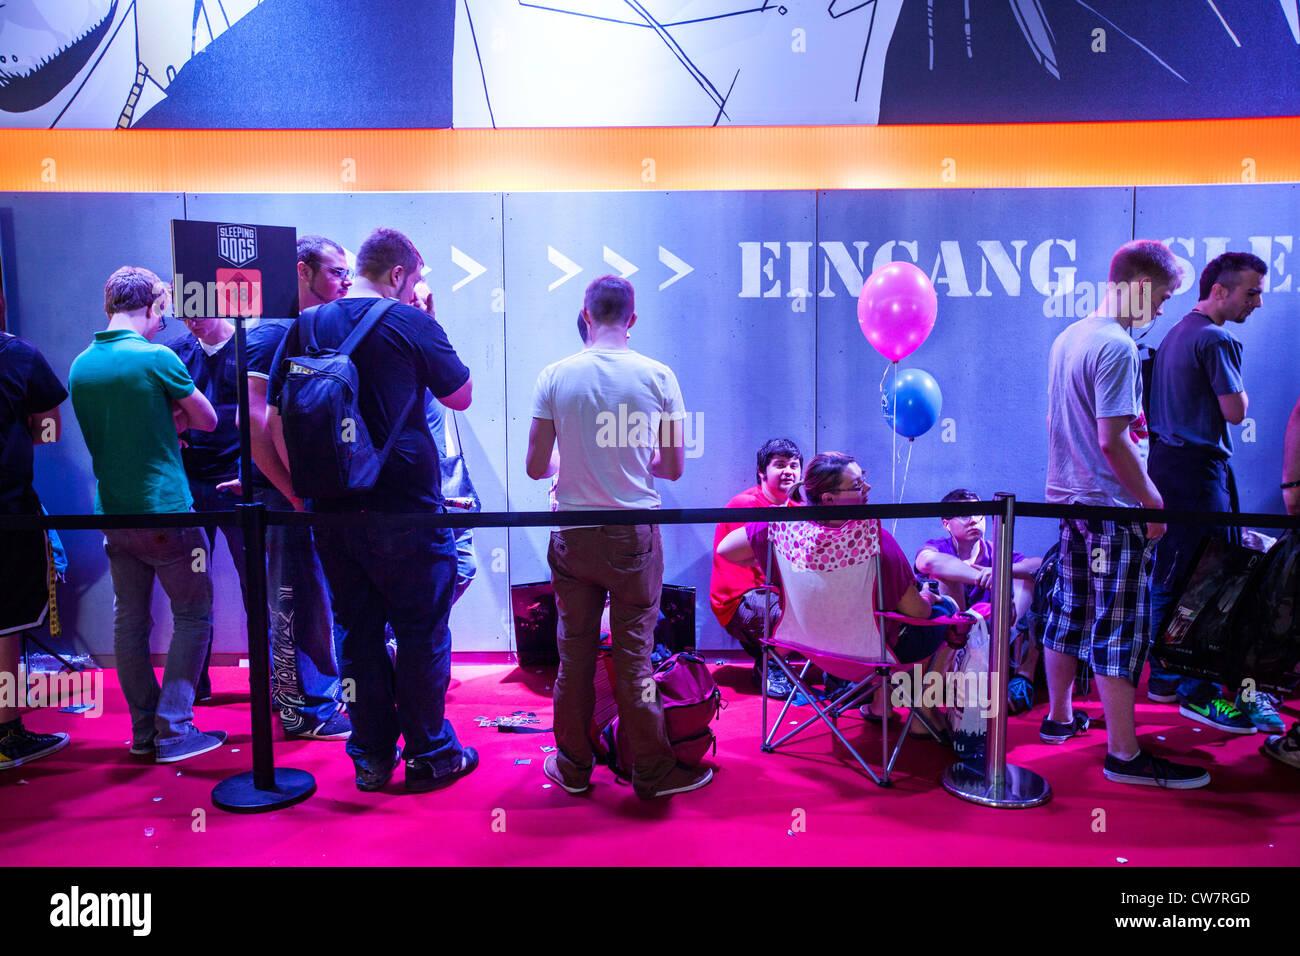 Free gambling gamescom internet online society and gambling